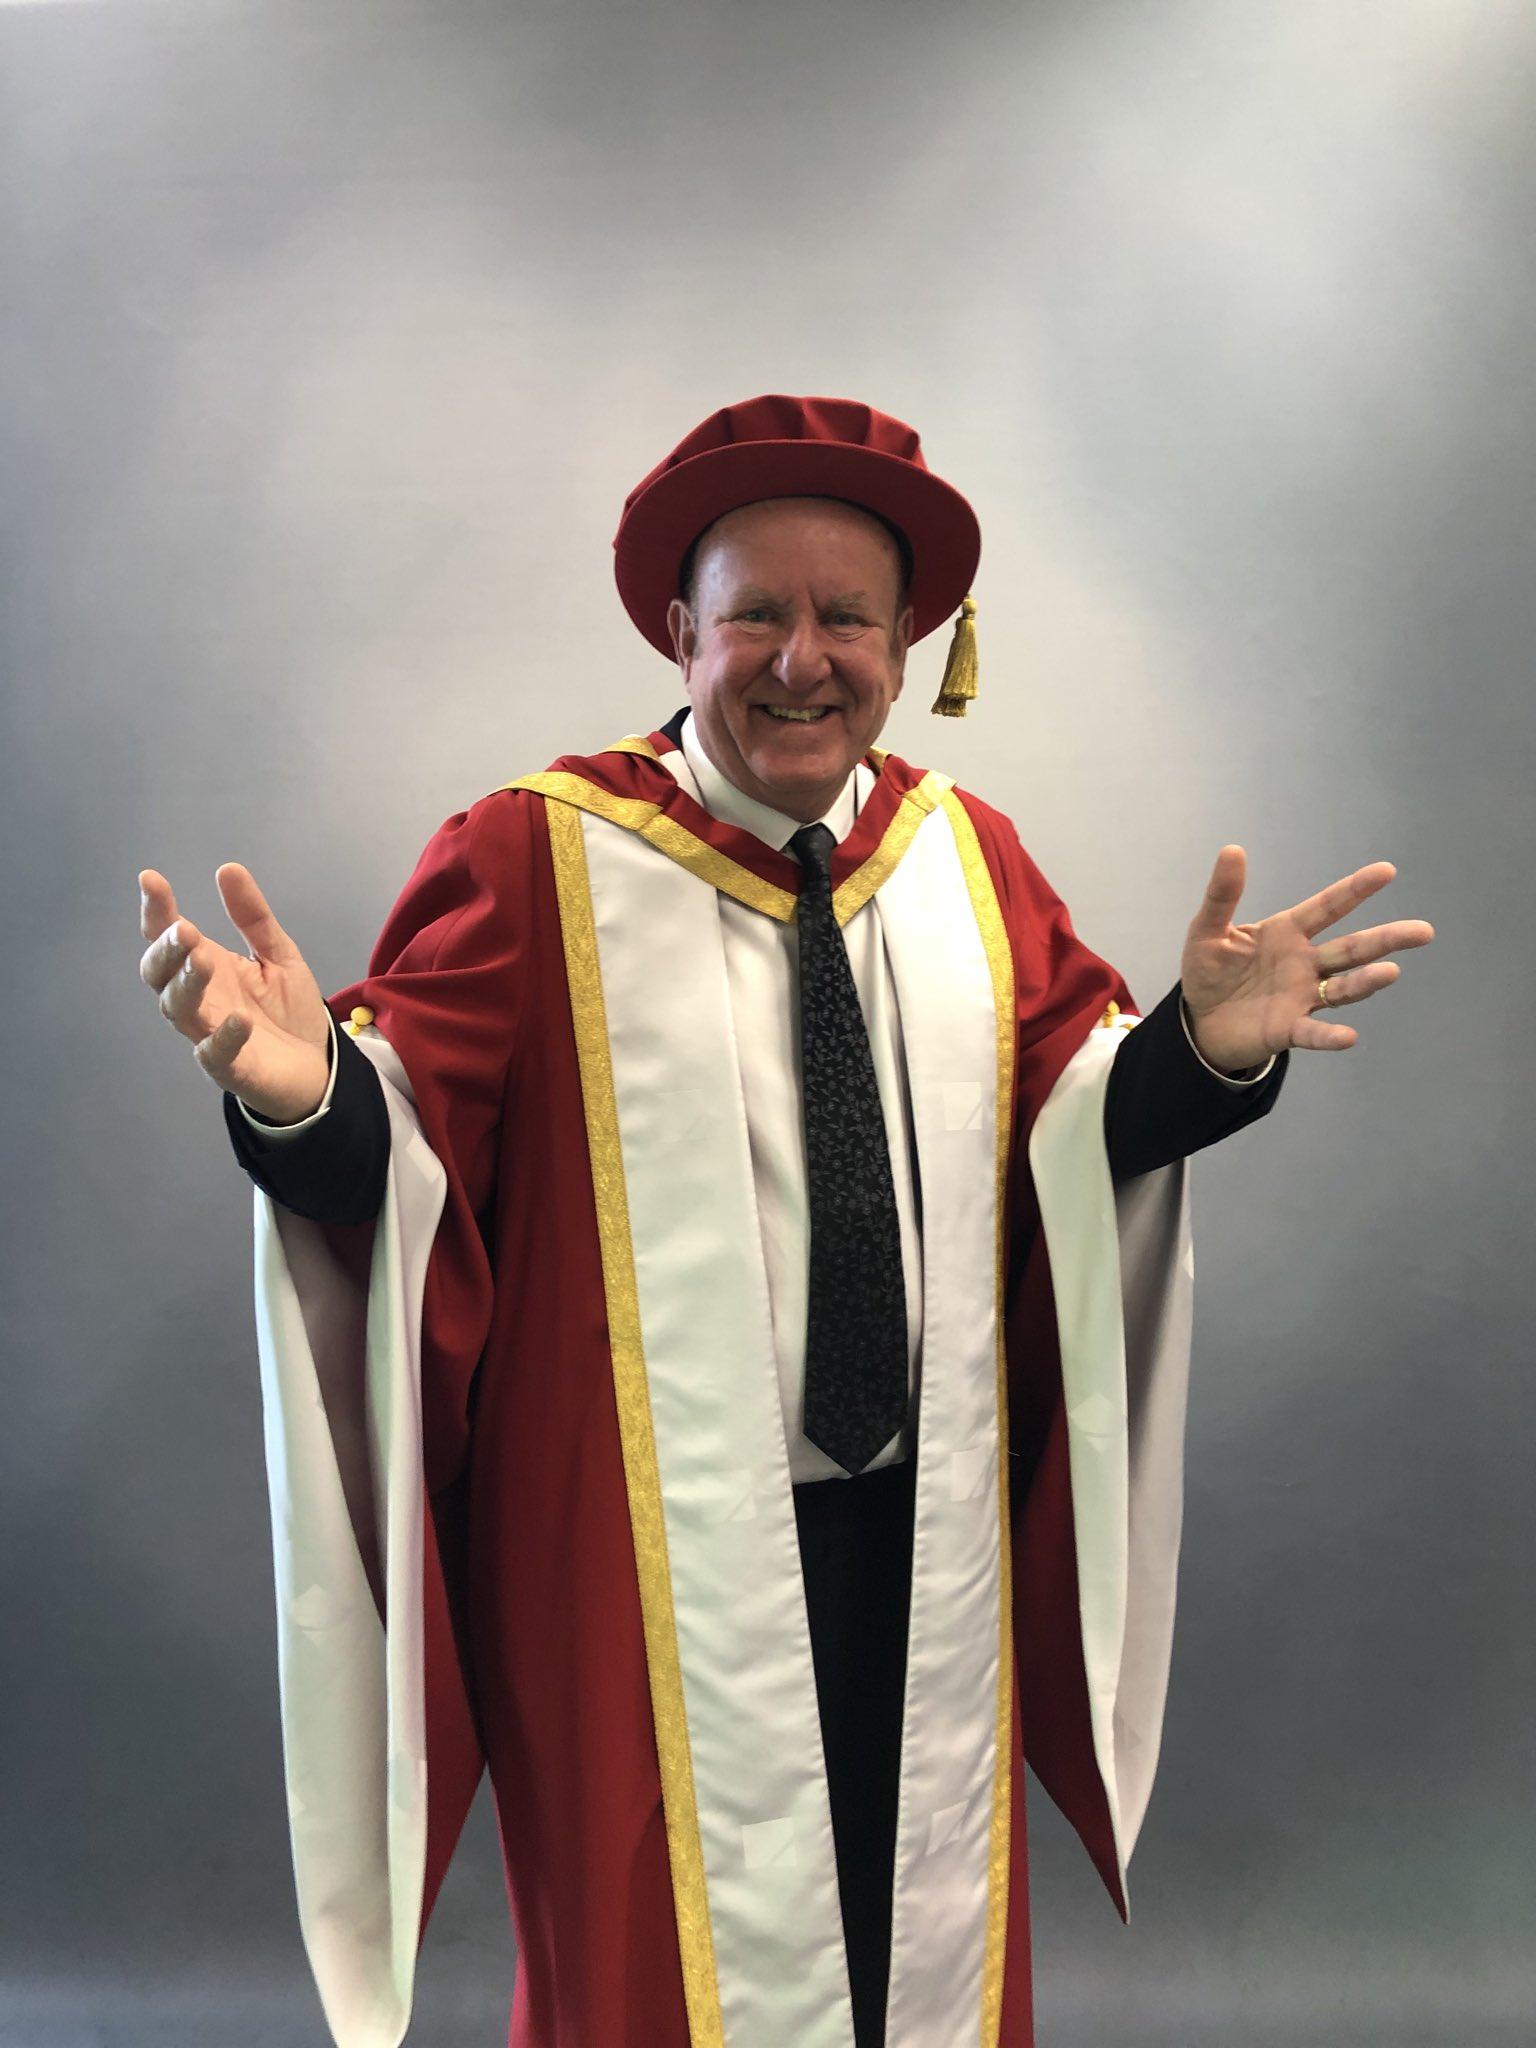 Ian Livingstone honourary degree at University of Suffolk